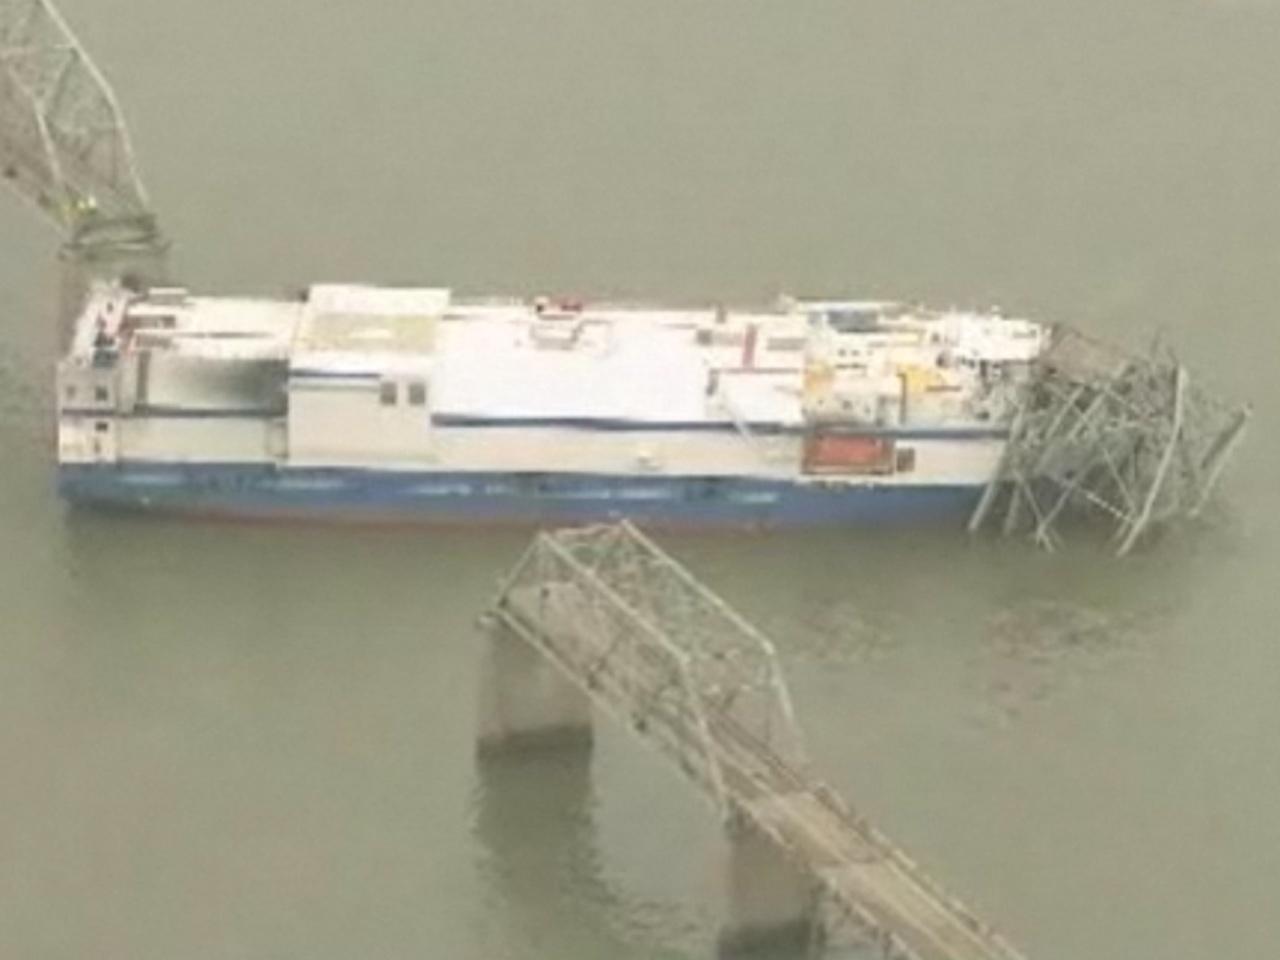 Ship hauling rocket parts smashes into Ky  bridge - CBS News